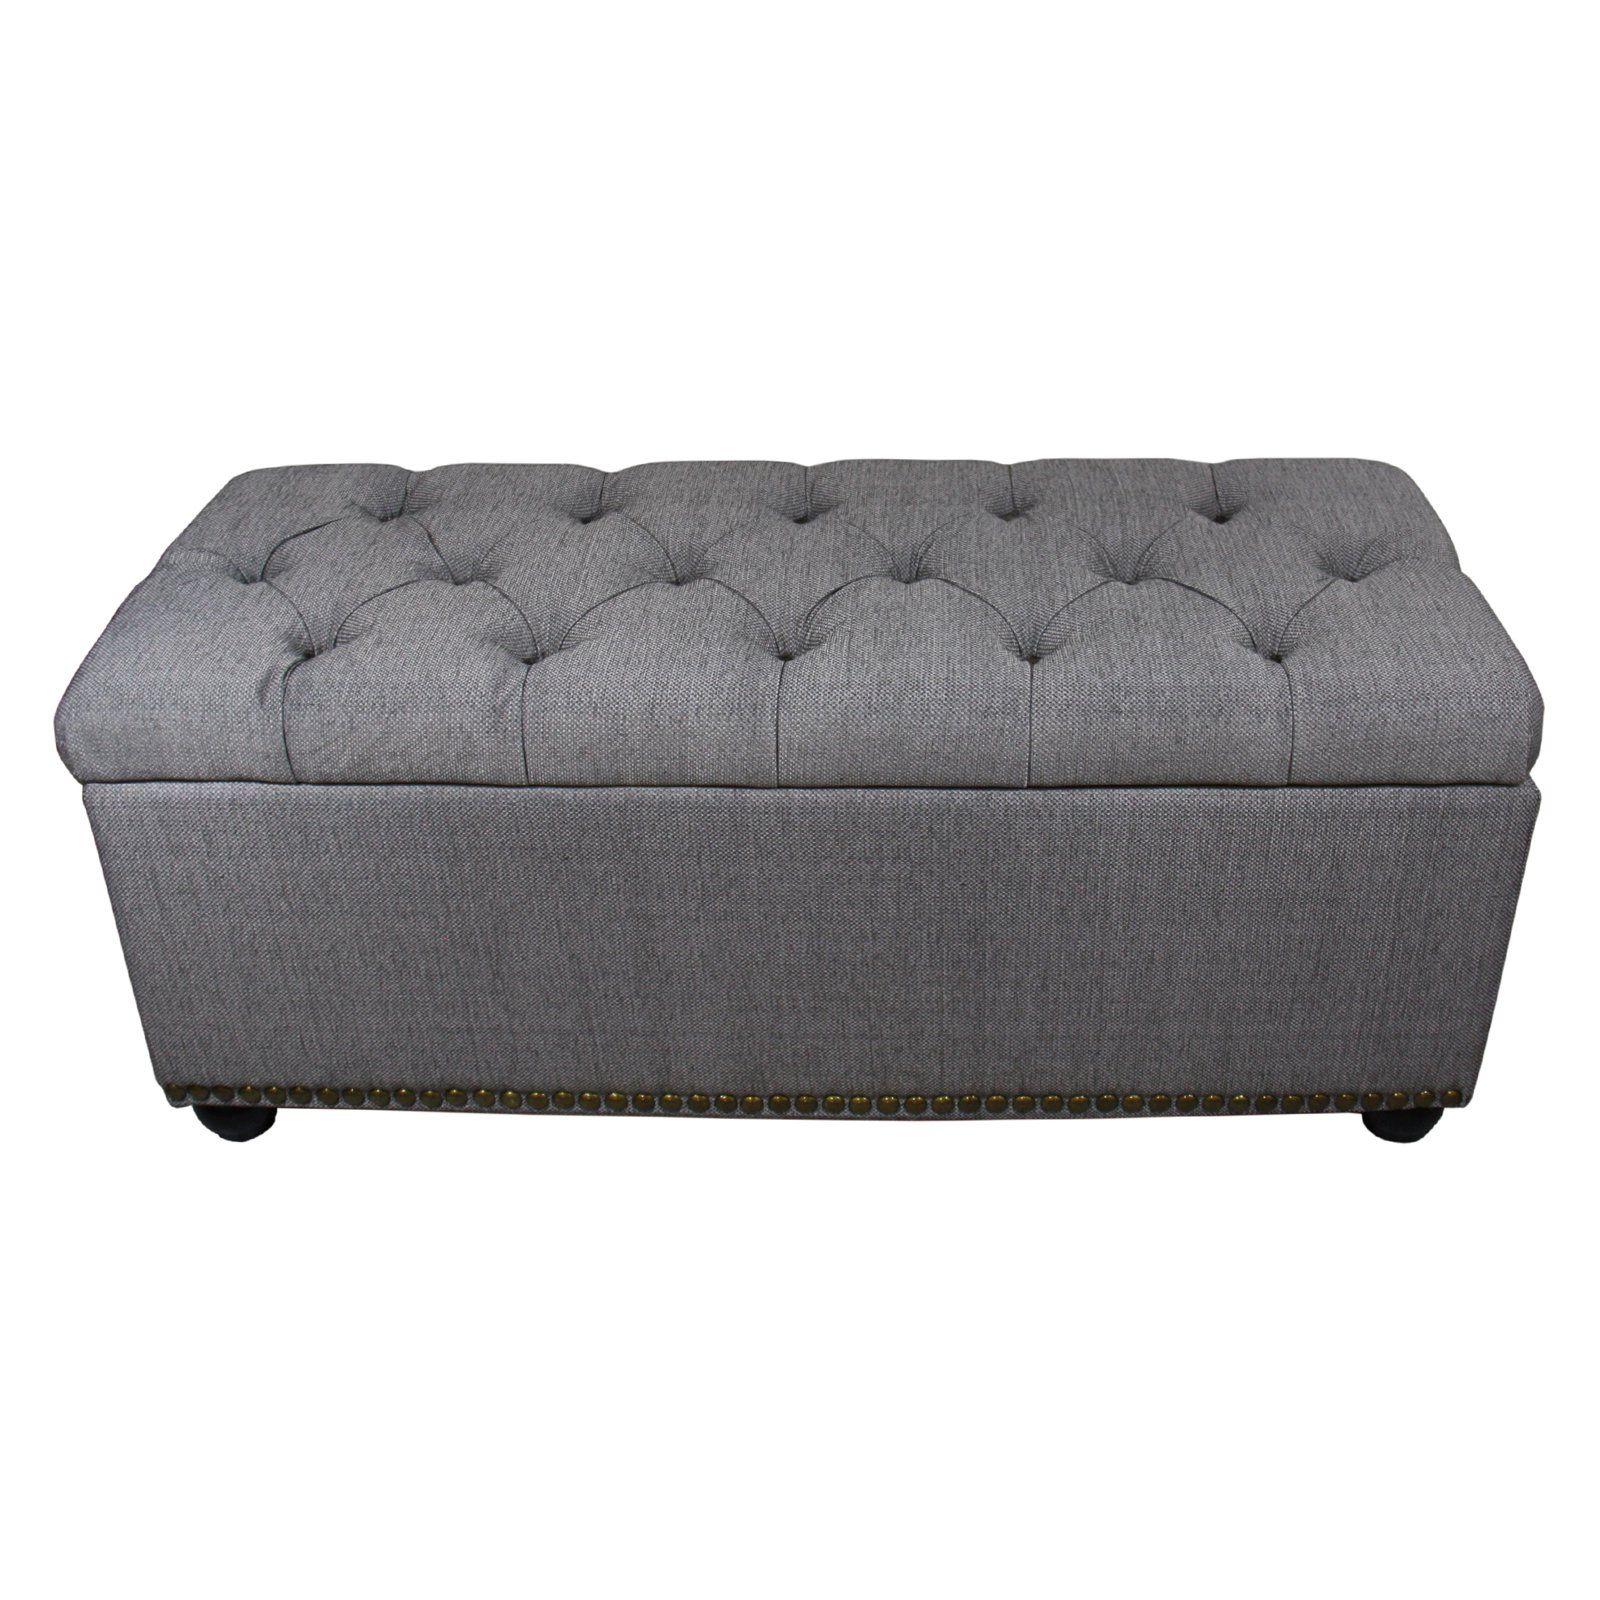 Ore International Tufted Grey Storage Bench With 3 Piece Ottoman